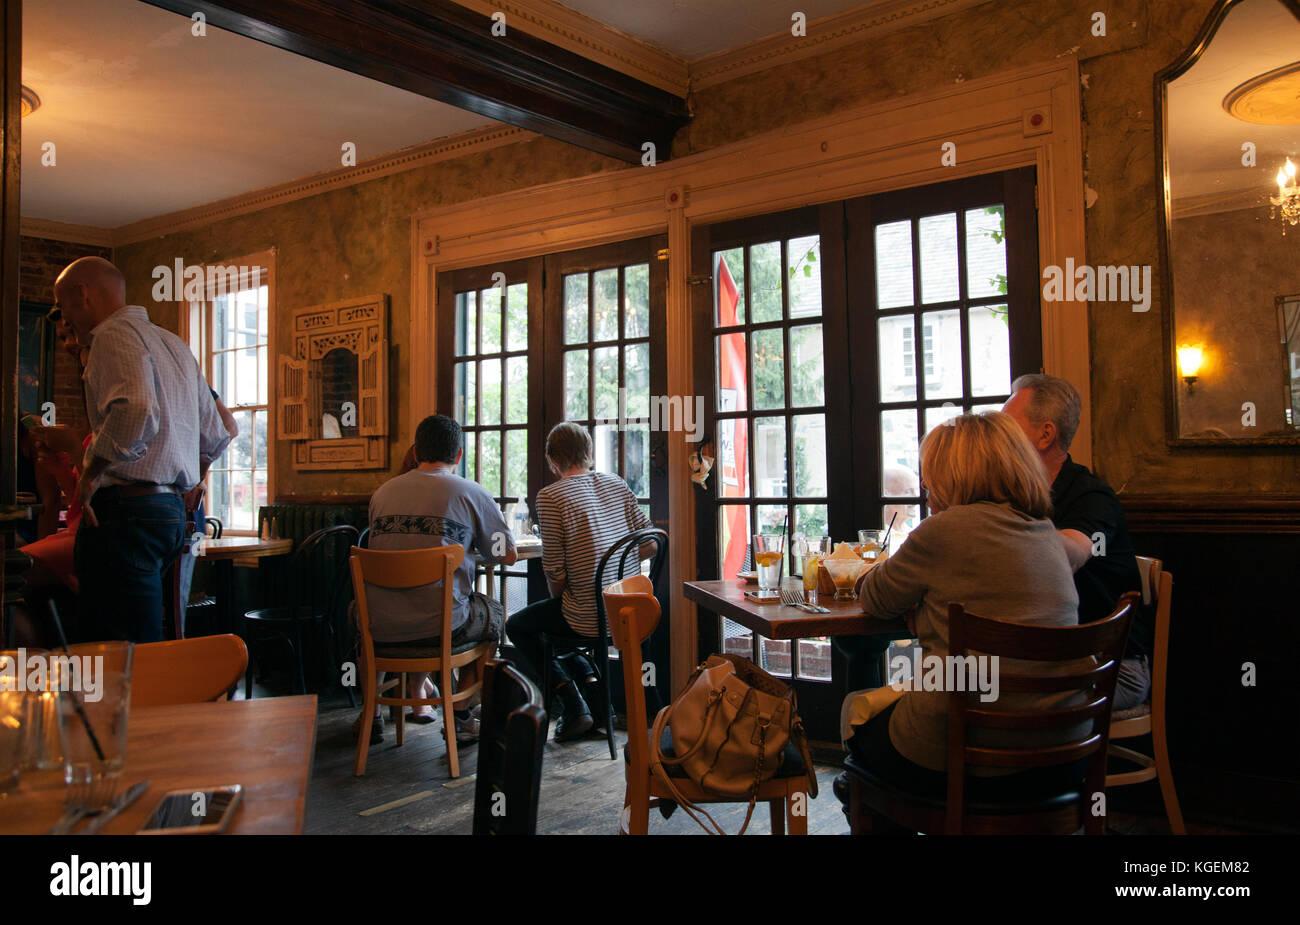 Karlas Restaurant in neue Hoffnung - Pennsylvania - USA Stockbild